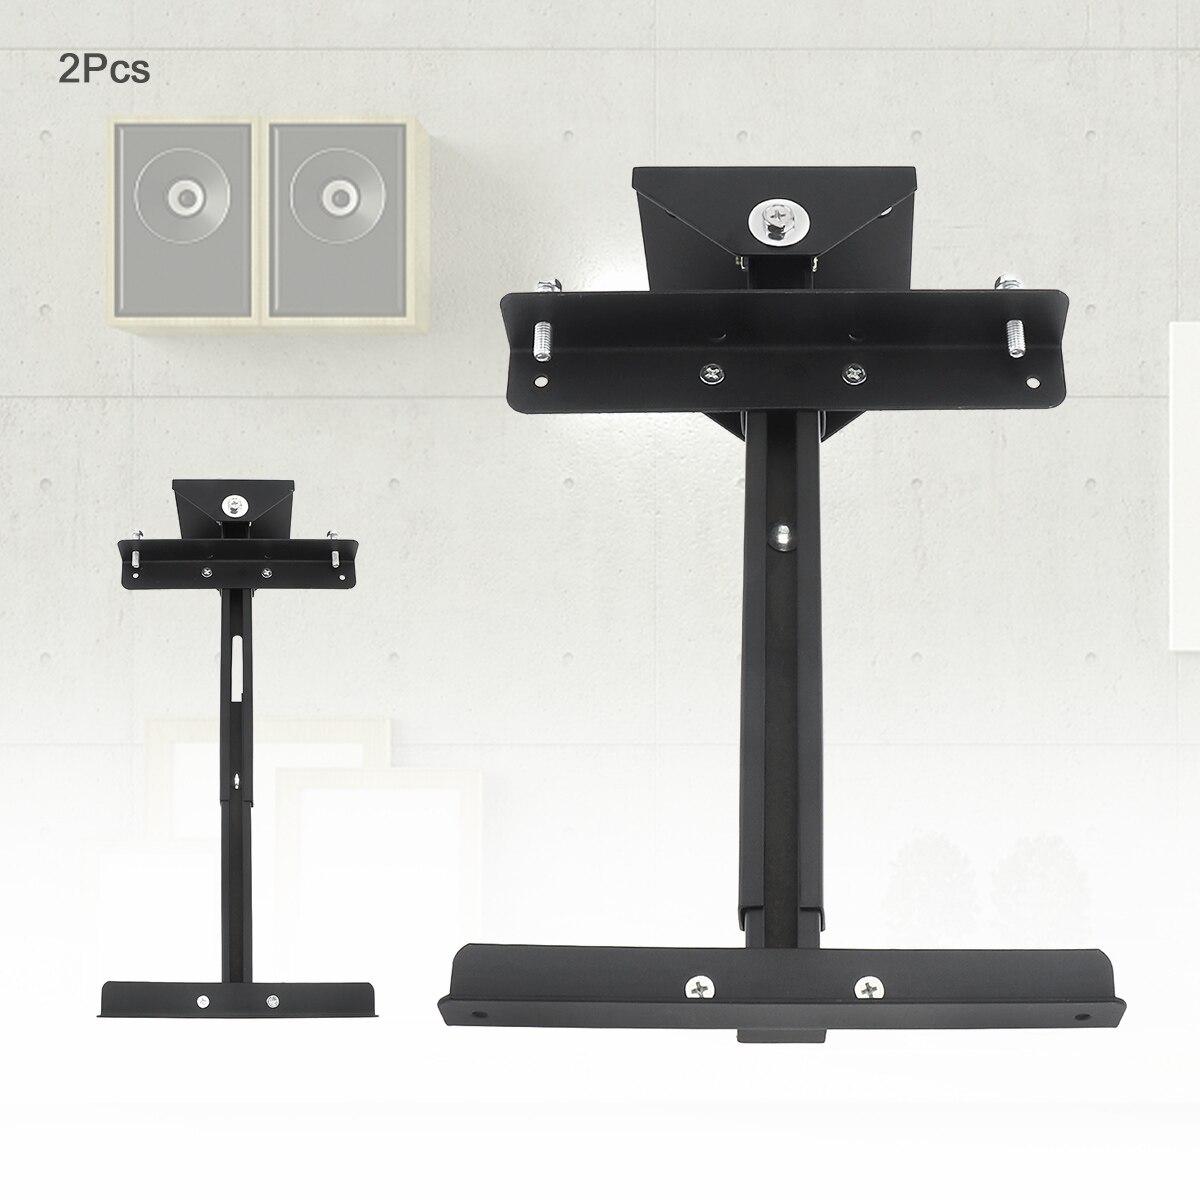 2pcs Universal SPS-200 20KG Metal Telescopic Type Speaker Bracket For Book Shelves And Speakers Support Horizontal 180° Rotation